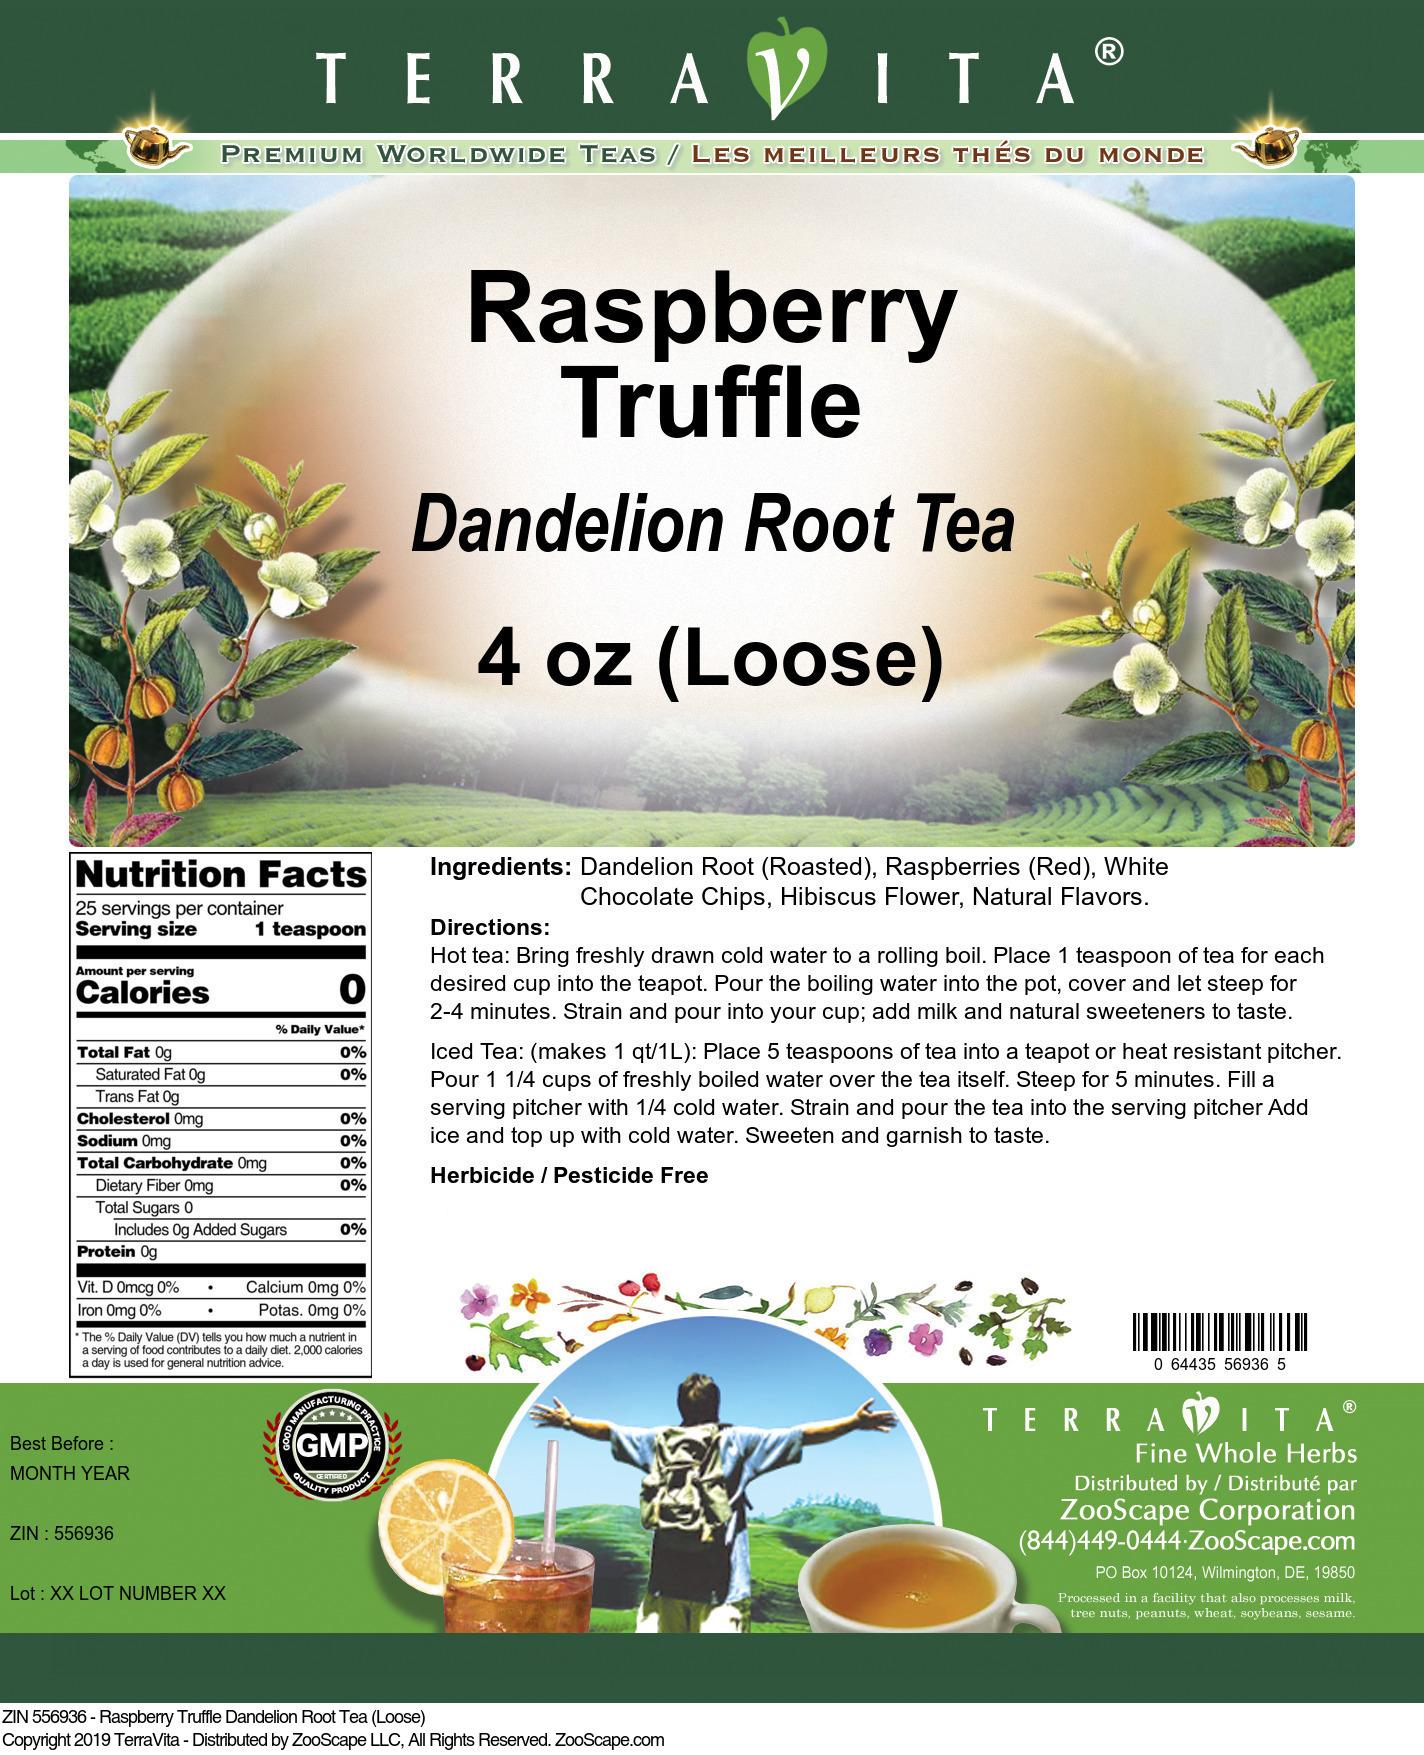 Raspberry Truffle Dandelion Root Tea (Loose)